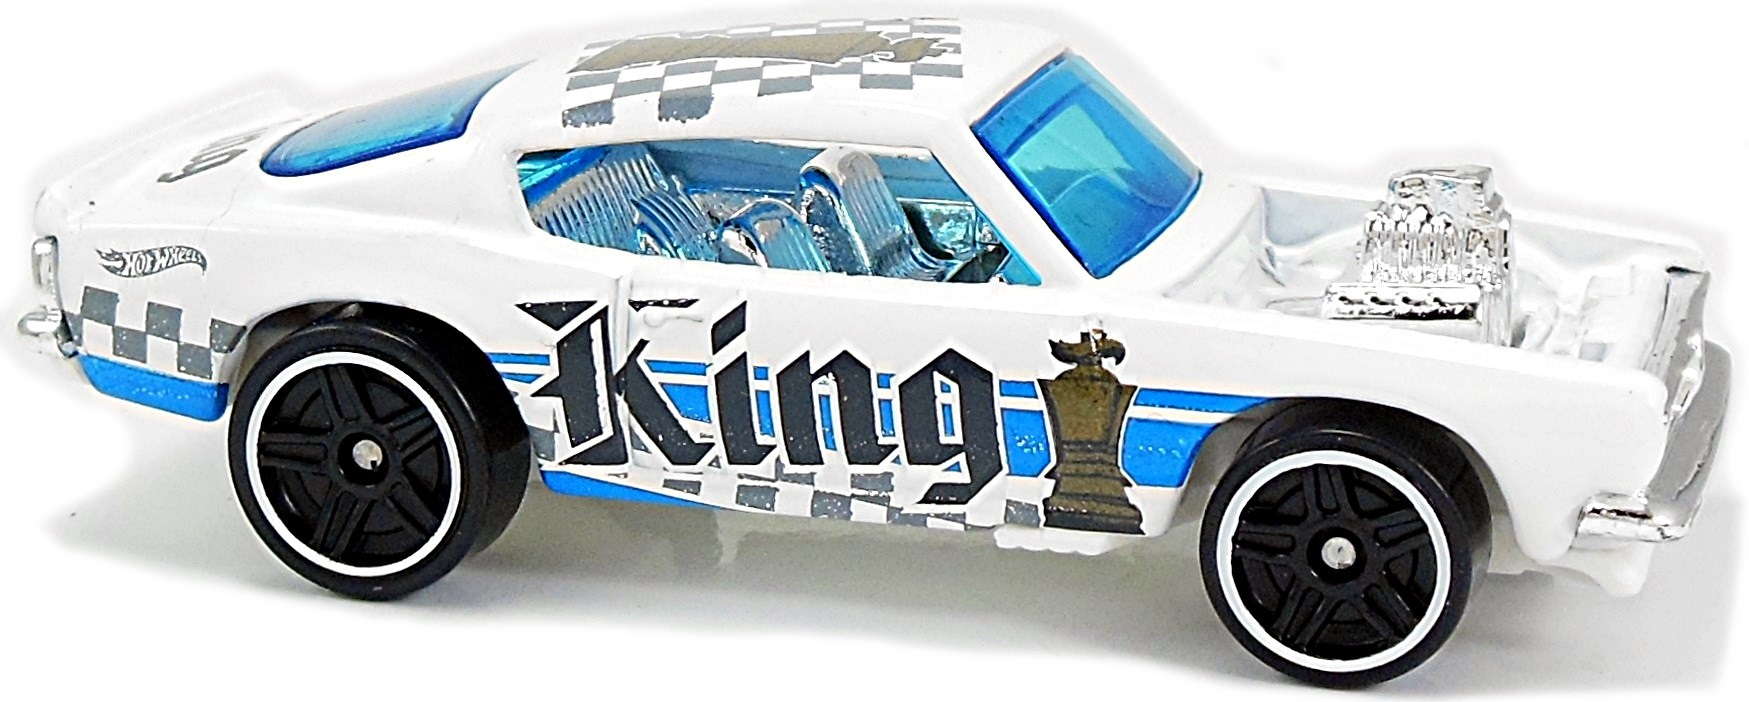 Platte 6 x 6 abgerundet neu dunkelgrau 6003 4500517 NEU LEGO Basic Bau 4 Stk